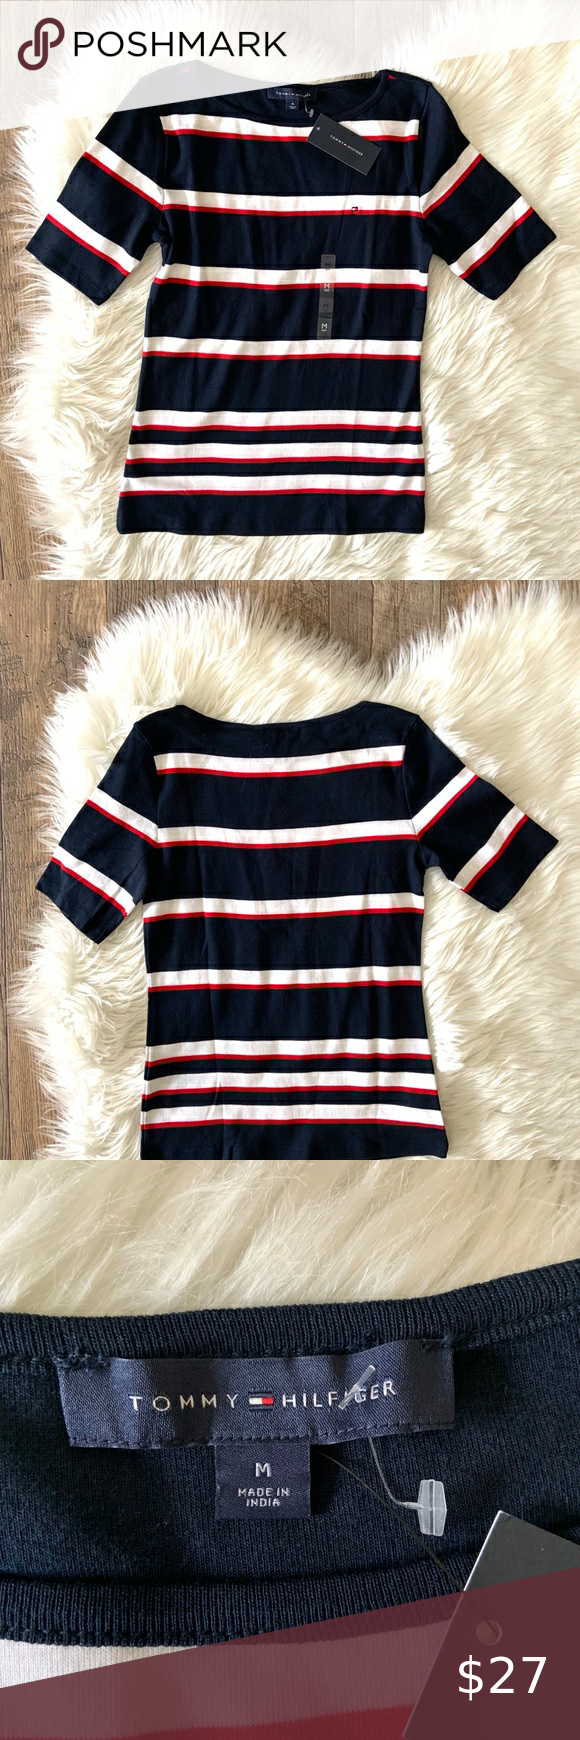 Tommy Hilfiger Women S Striped T Shirt Knit Sz M Tommy Hilfiger Women Tommy T Shirt Tommy Hilfiger Polo Shirts [ 1740 x 580 Pixel ]